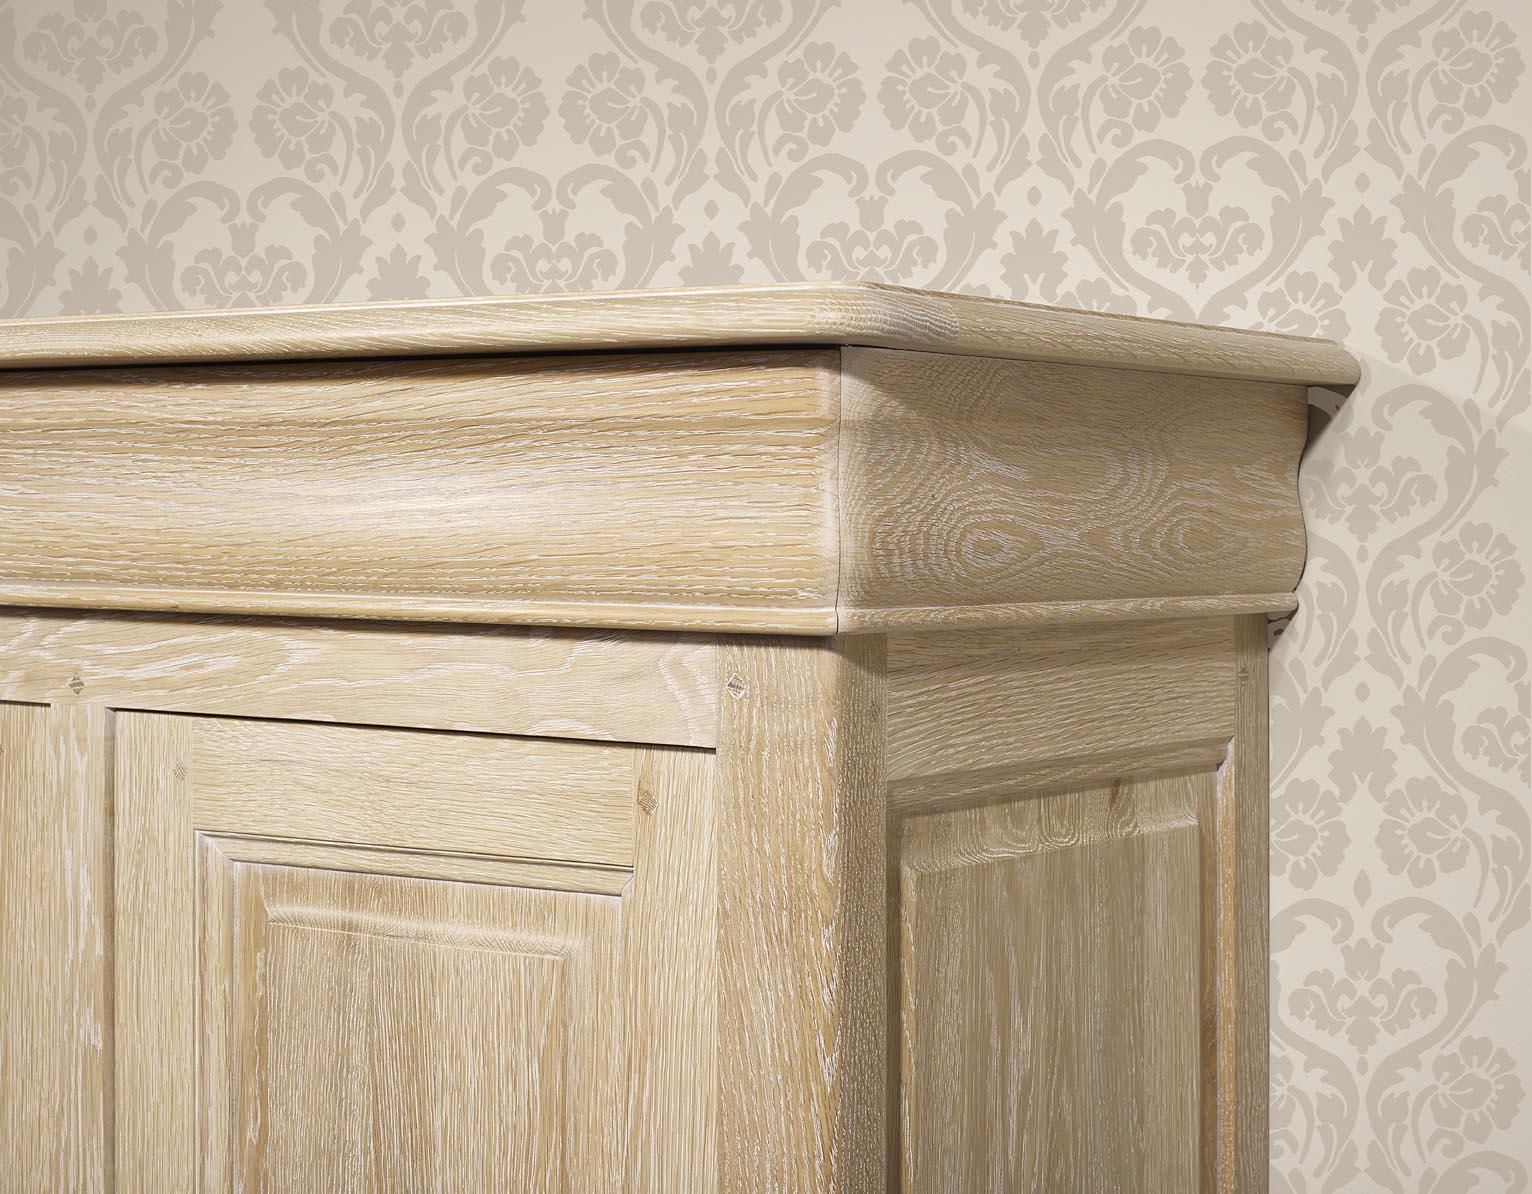 meuble en chne bassette 2 portes 3 tiroirs ralise en chne. Black Bedroom Furniture Sets. Home Design Ideas